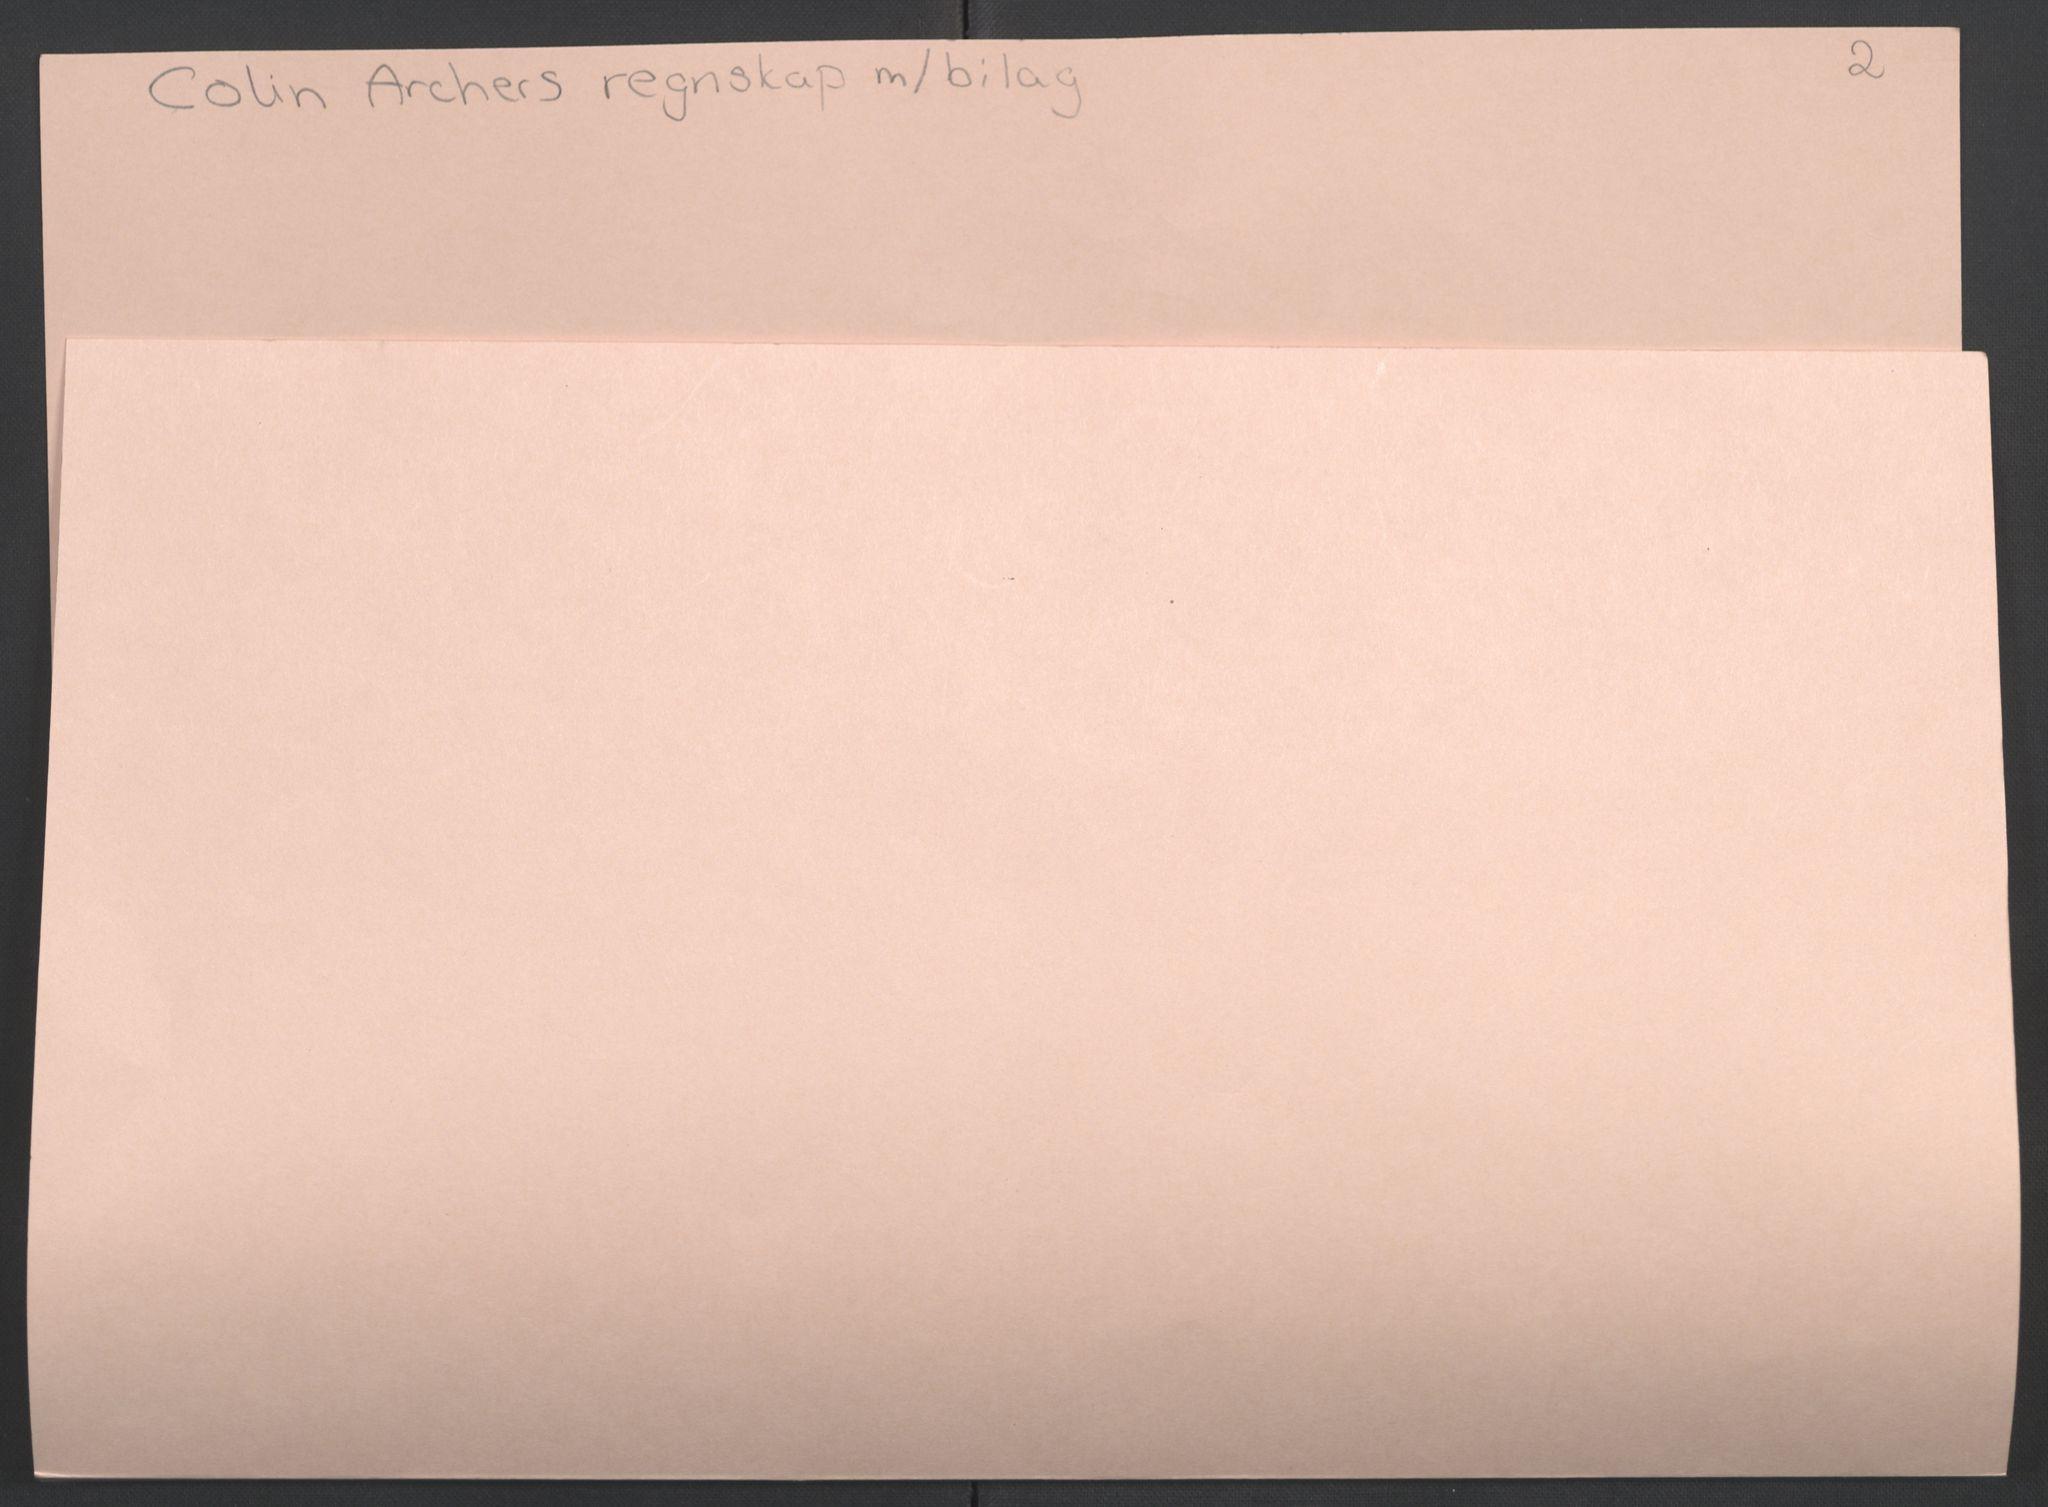 RA, Arbeidskomitéen for Fridtjof Nansens polarekspedisjon, R/L0006: Colin Archers regnskap m. bilag, 1891-1893, s. 2